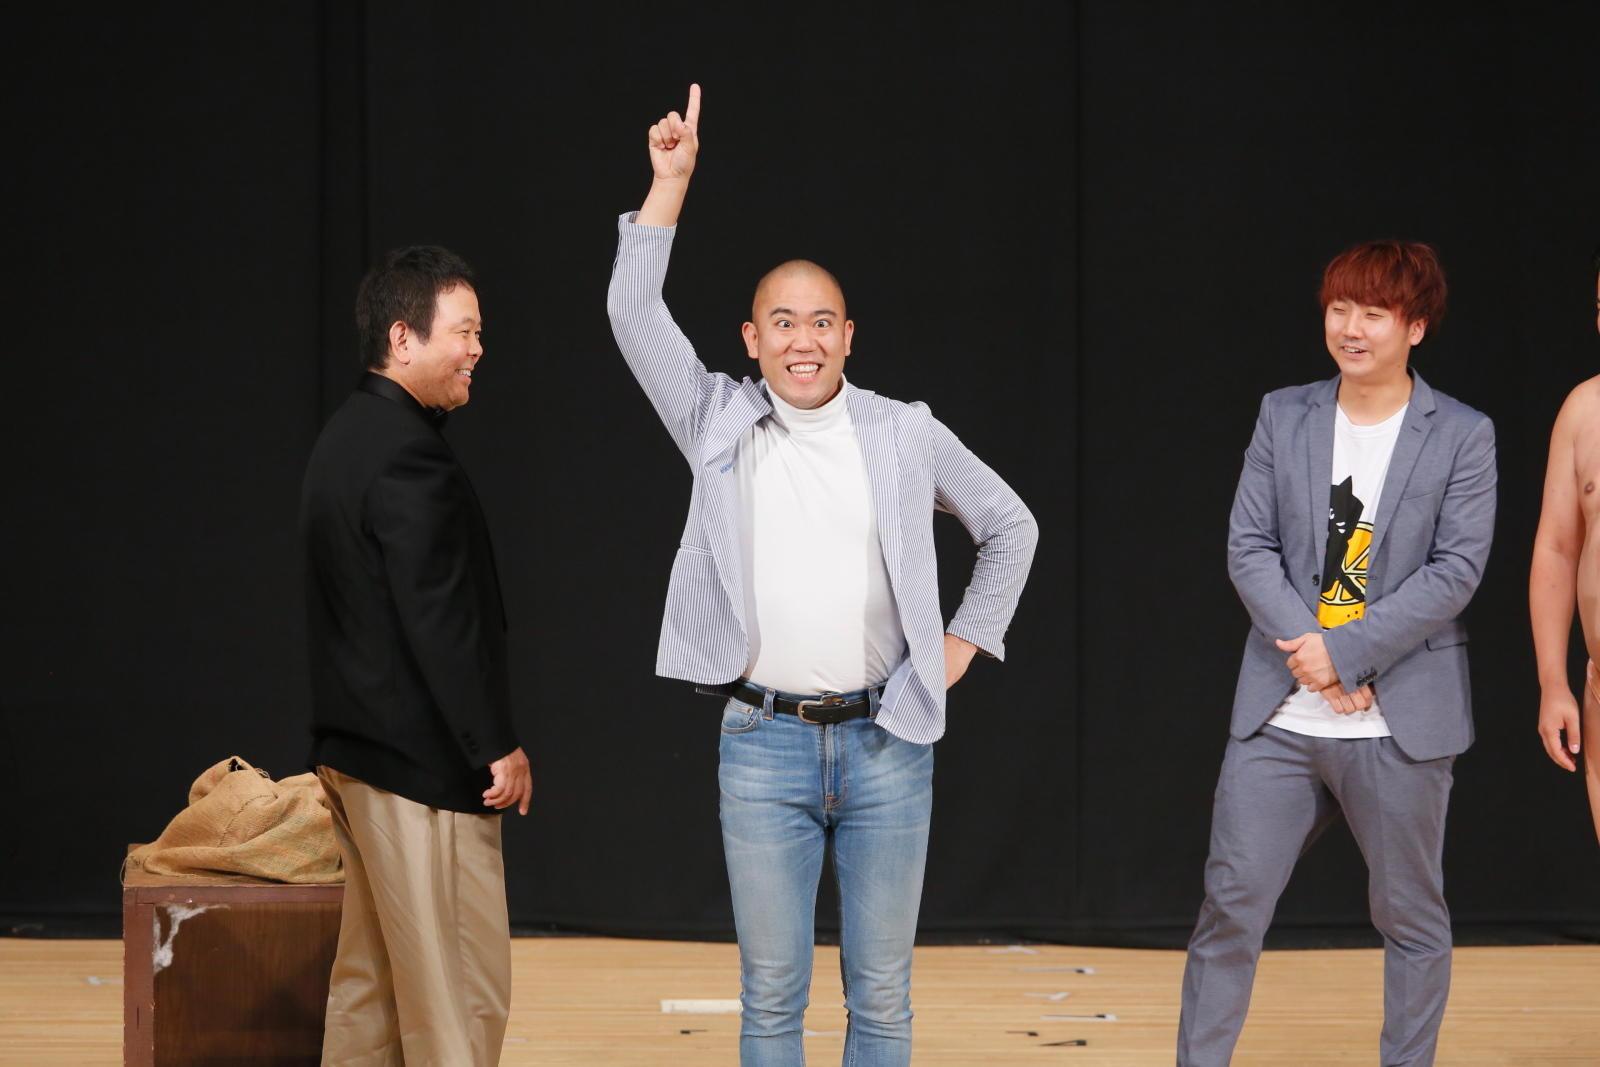 http://news.yoshimoto.co.jp/20160630001715-57c6a37b6e8e84935f5519ffb11fb3139527236f.jpg